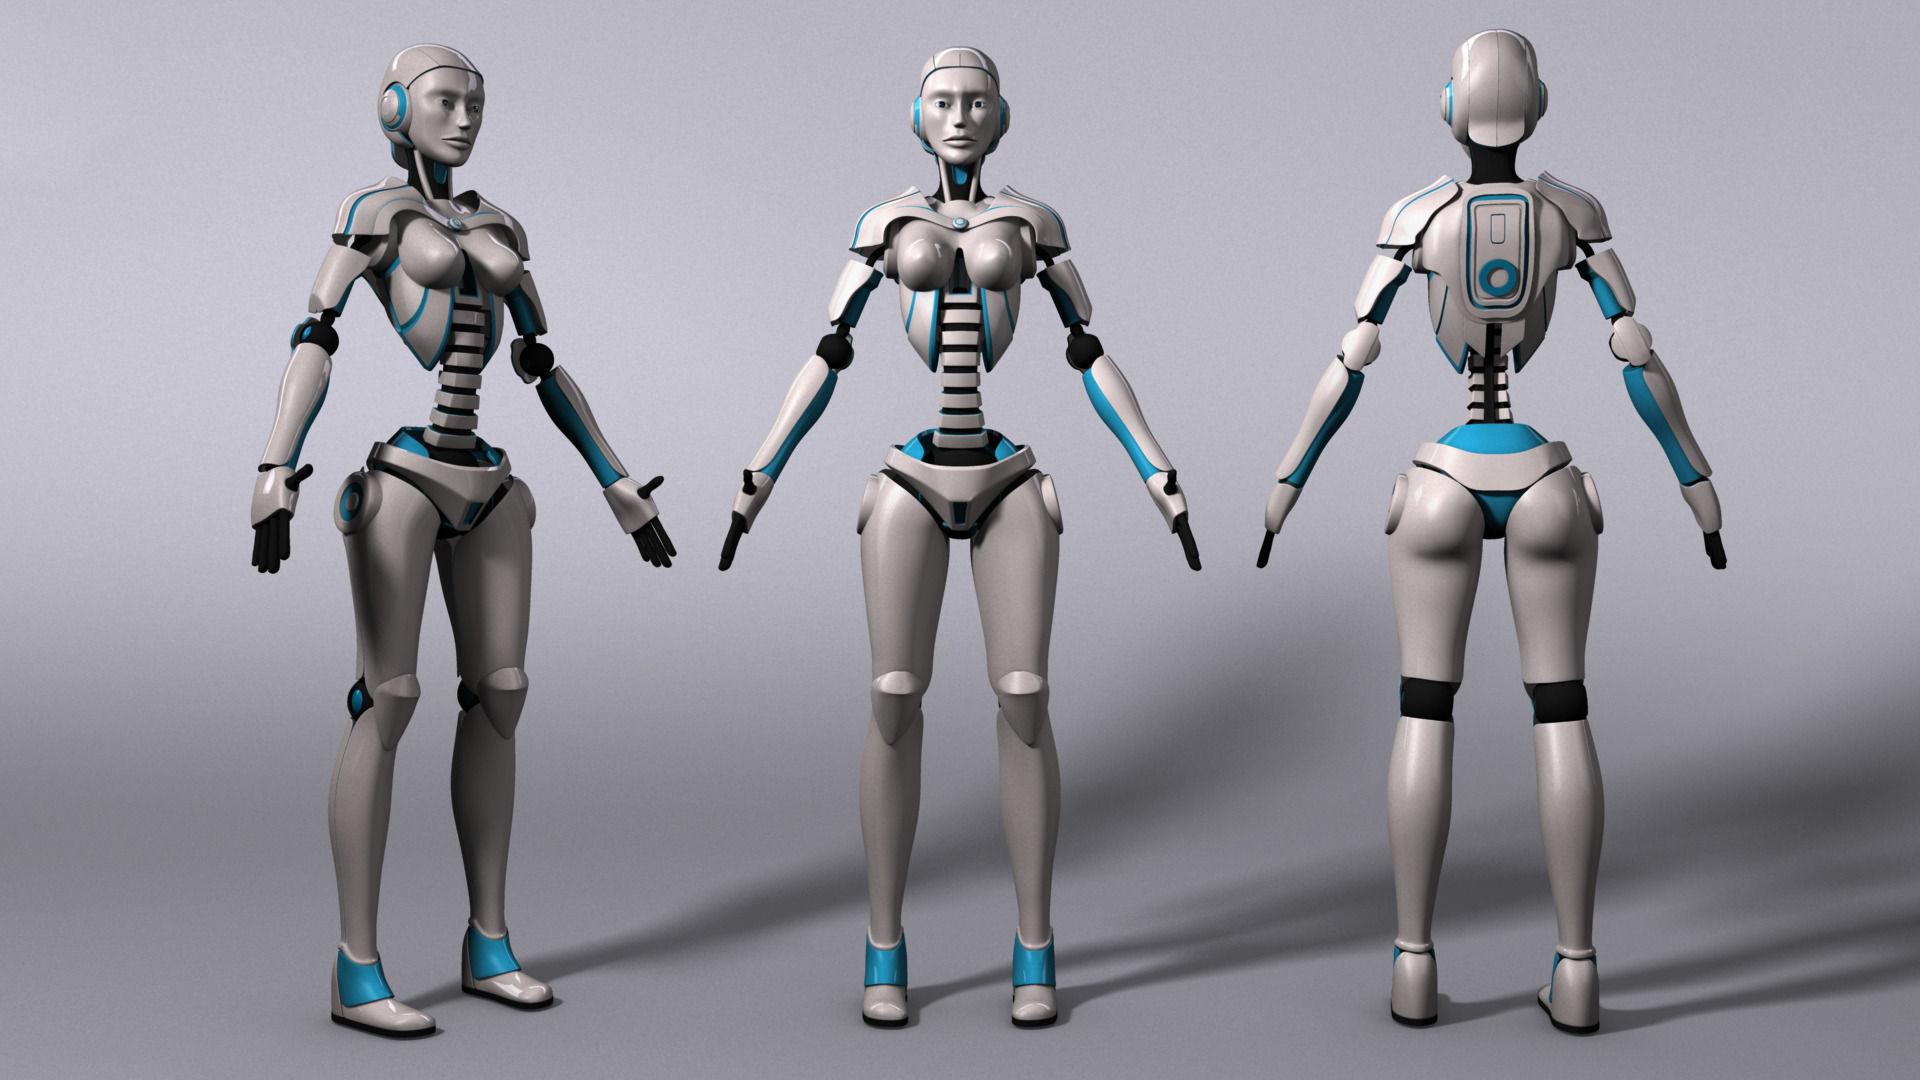 Realistic robot simulation